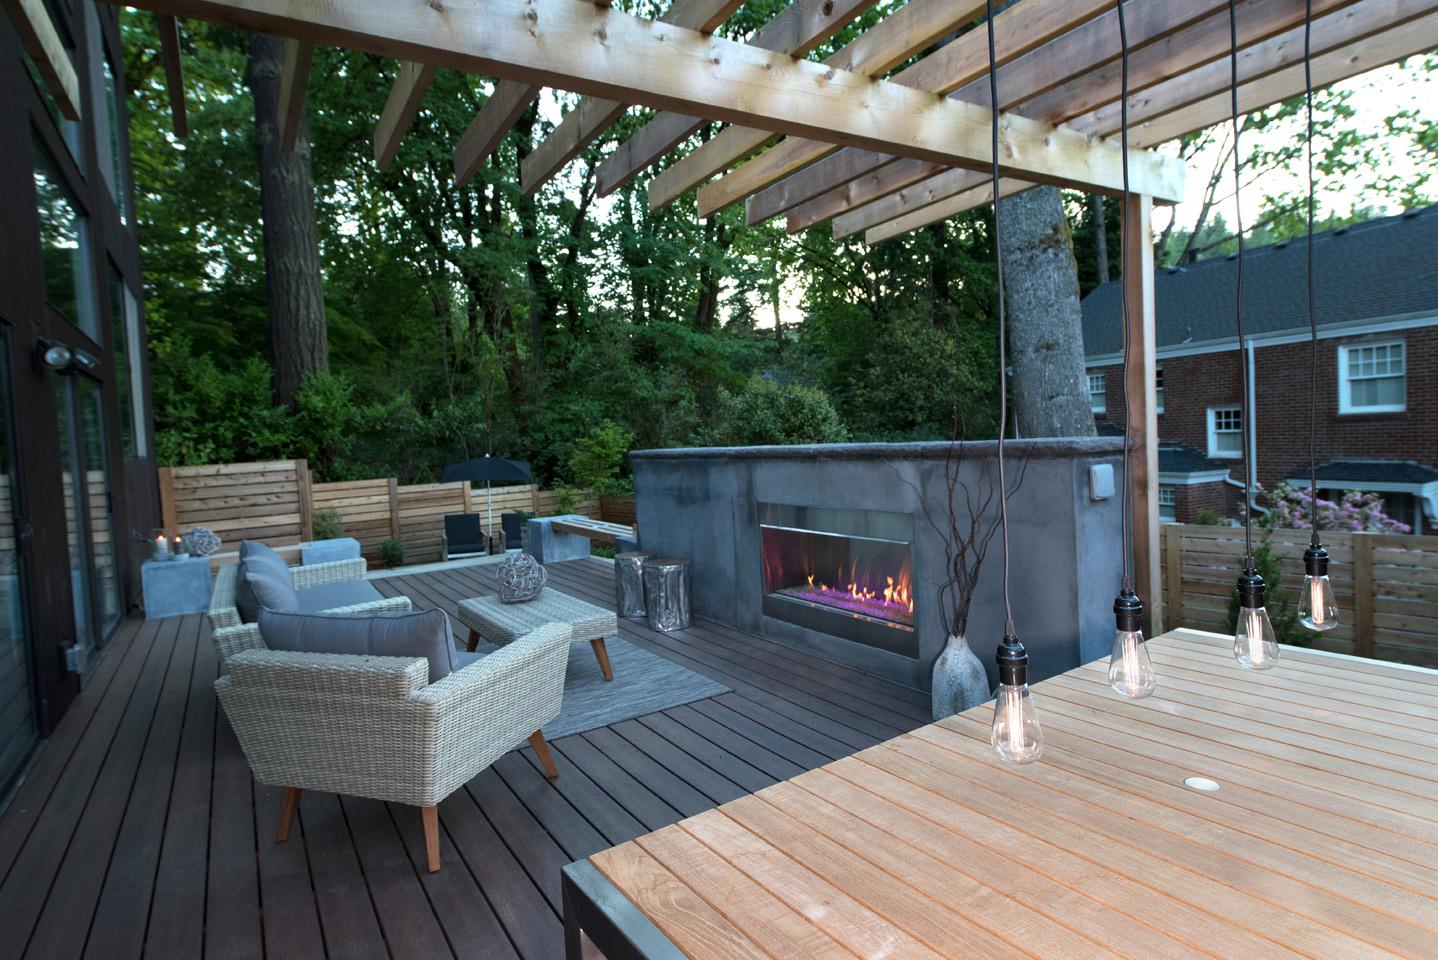 Outdoor living design reveal 2017 james paradise for Exterior living